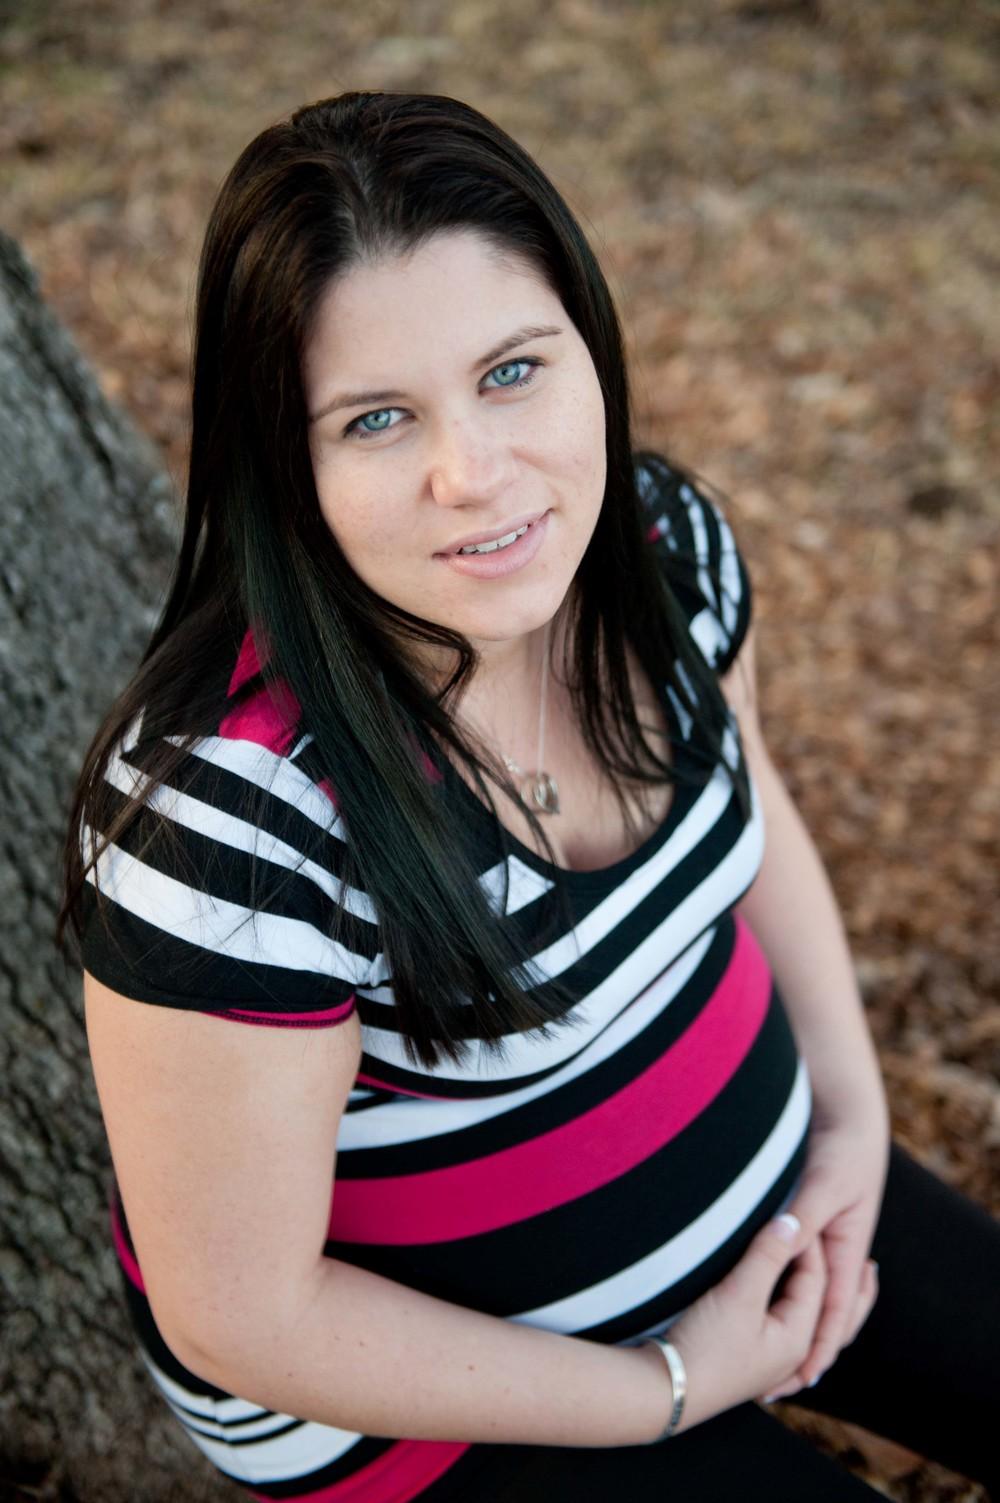 Lynchburg VA maternity photography